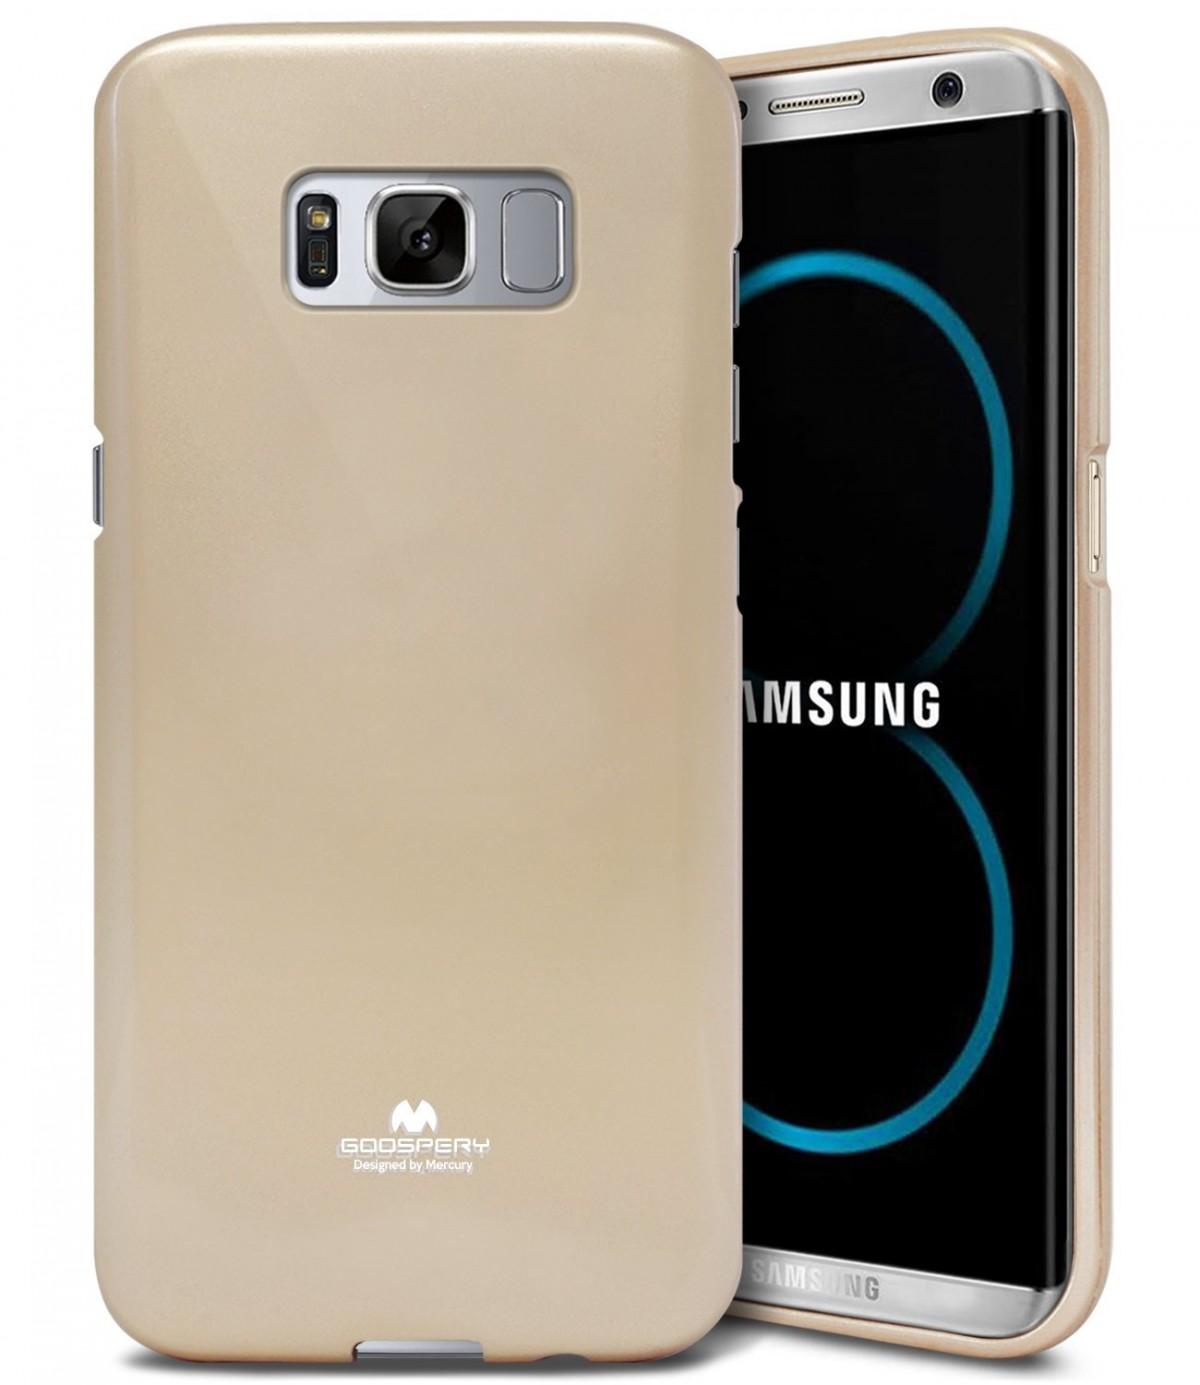 Silikonové barevné obaly / kryty Goospery Mercury pro Samsung Galaxy S8 - Jelly Case - Zlatý